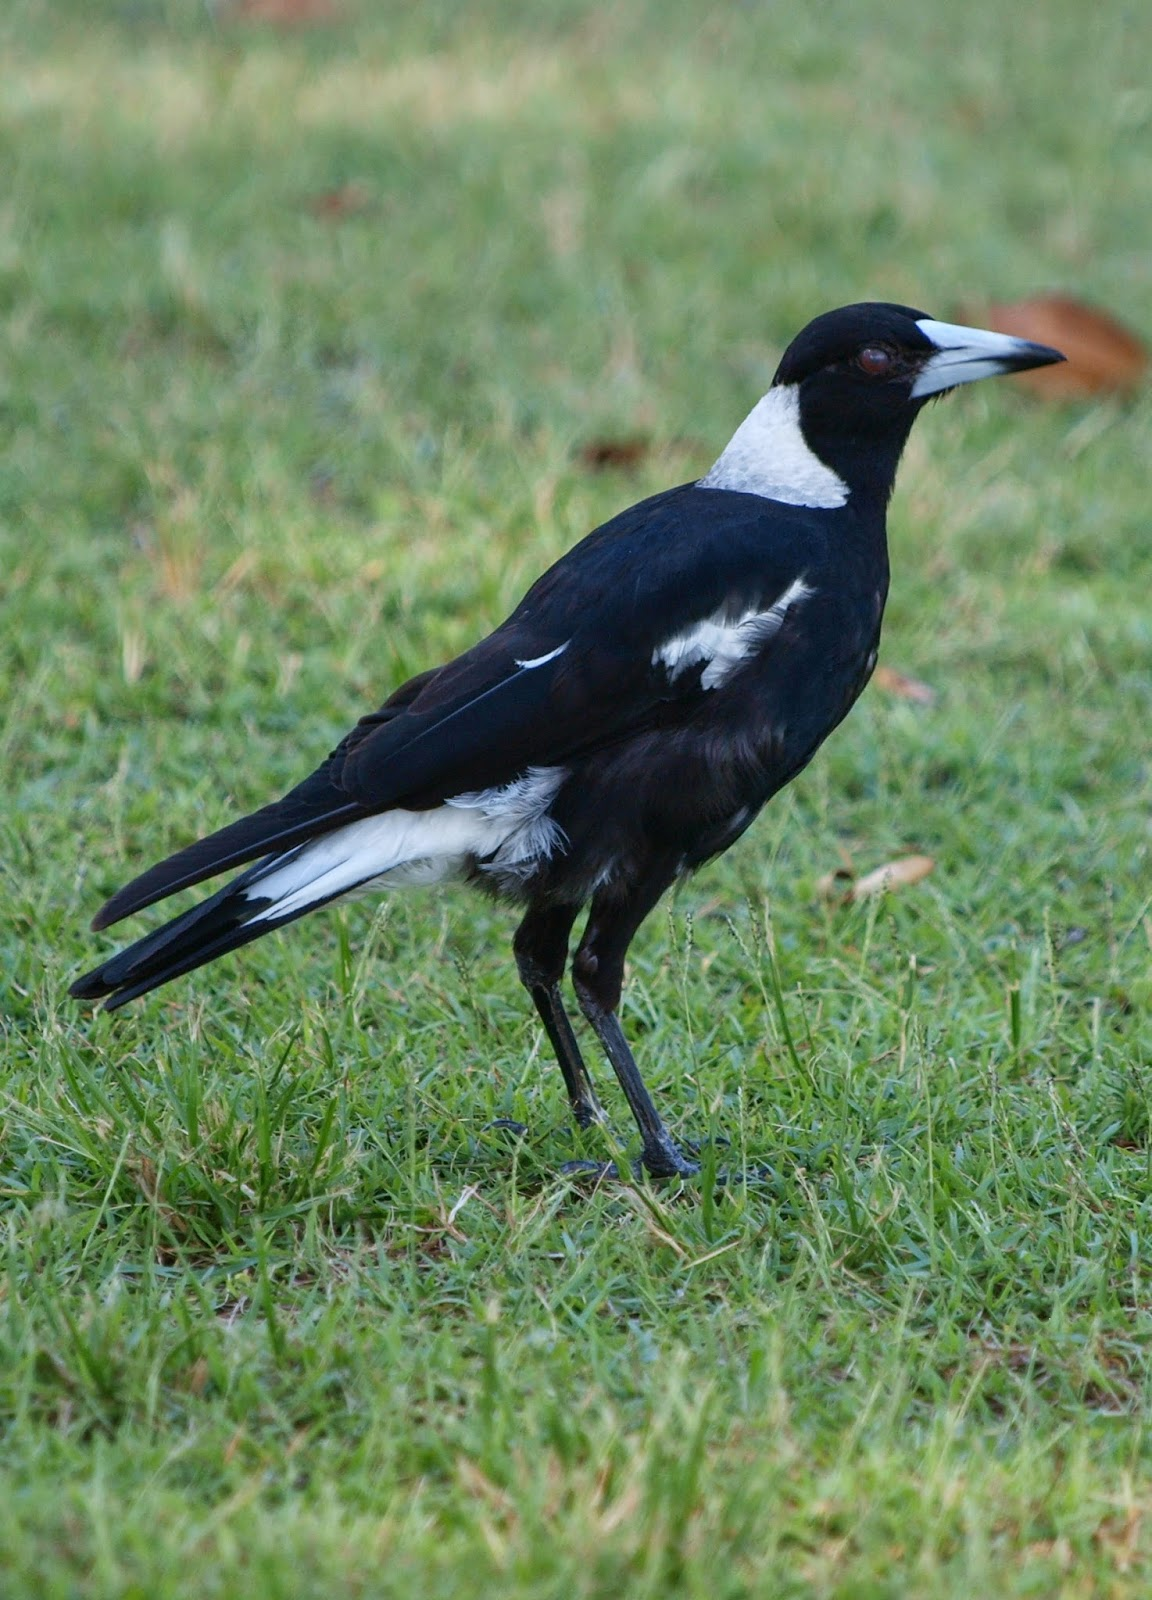 birding the costa: 7. Goodbye, Australia - photo#26